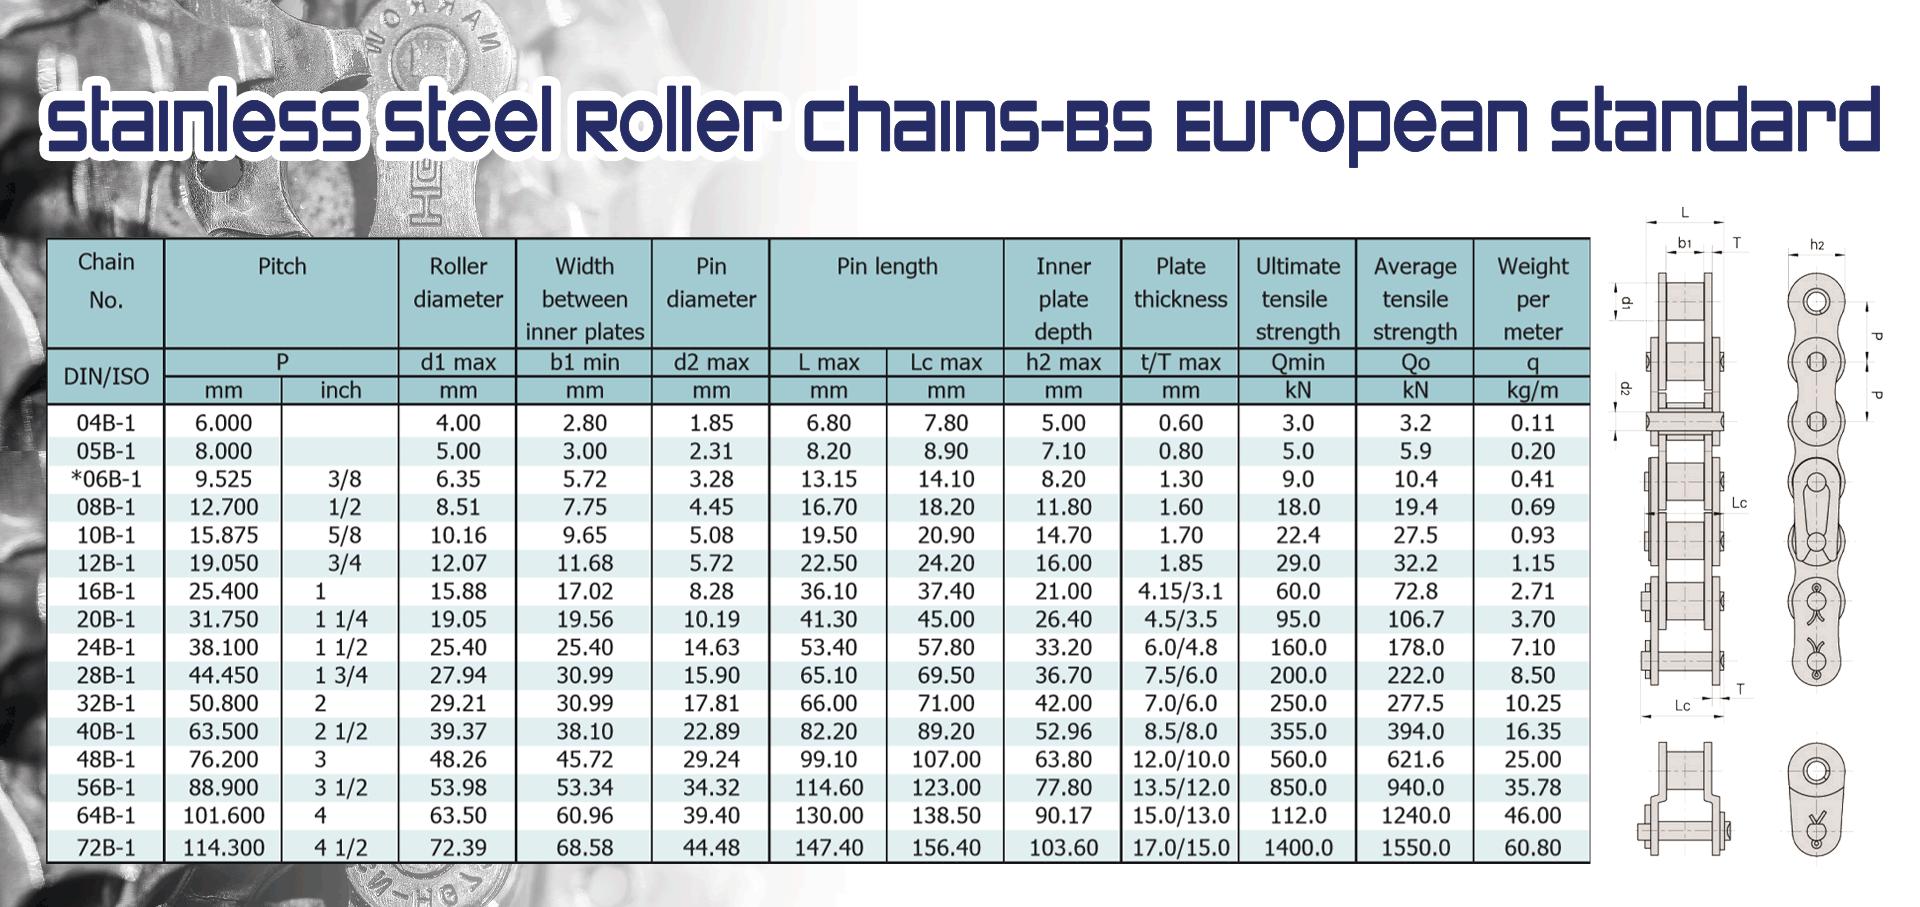 Stainless Steel Roller Chains-BS European Standard (โซ่ขับสแตนเลส มาตรฐานยุโรป)